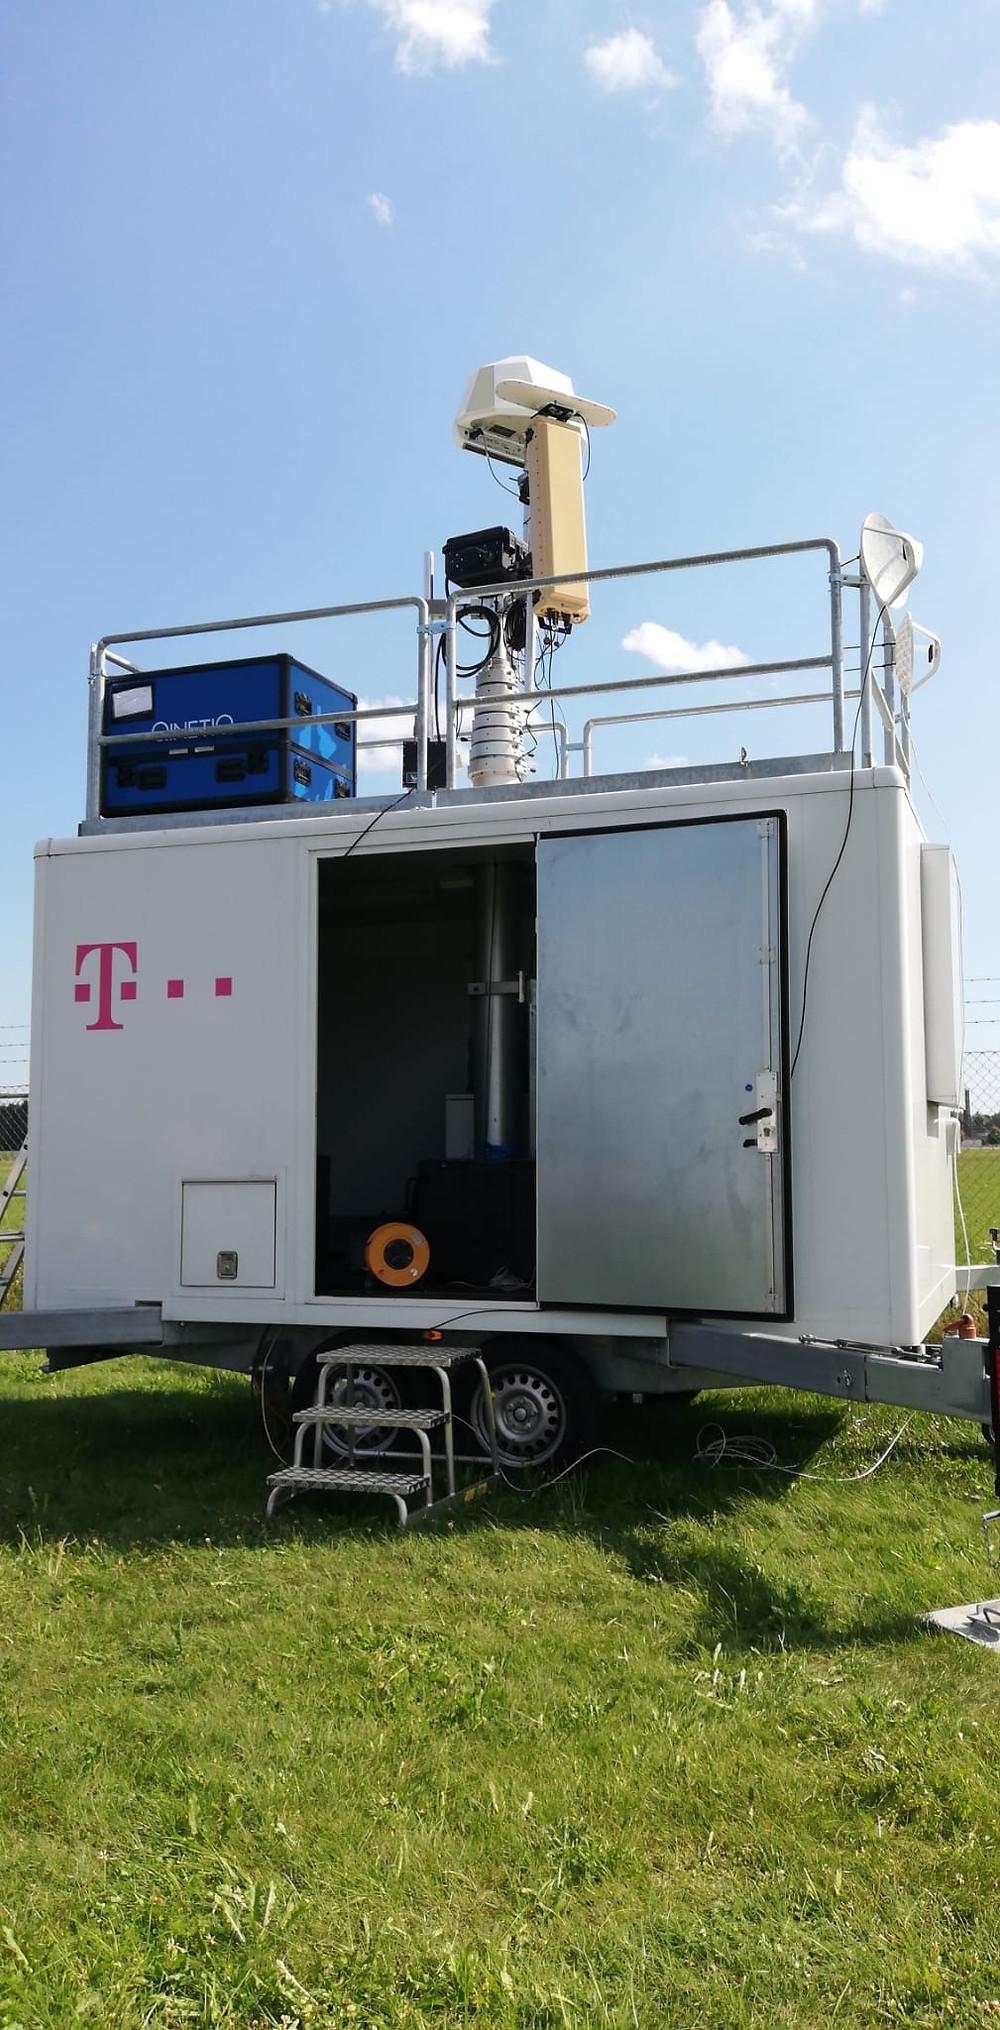 Droneshield successfully defends European airport with DroneSentinel in Deutsche Telekom trial